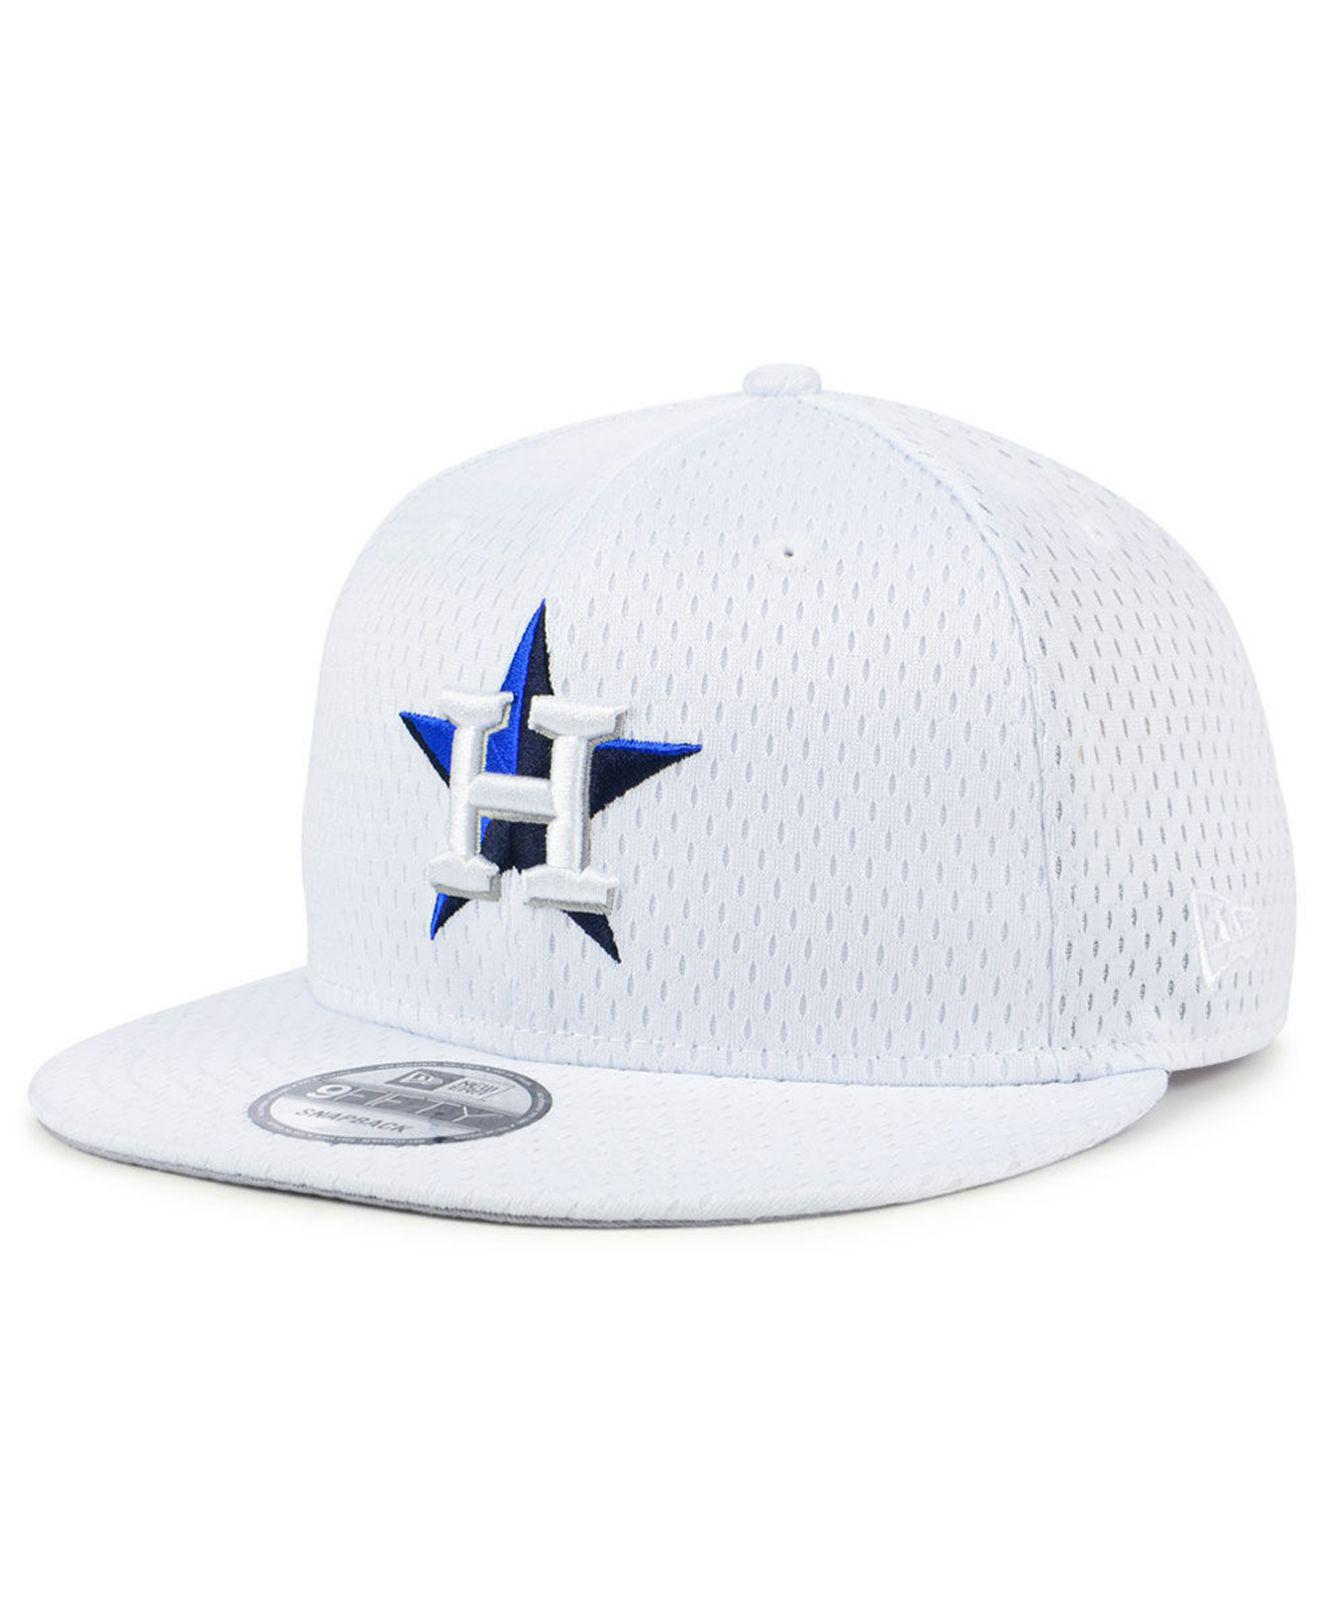 detailed look 116e6 03145 KTZ. Men s White Houston Astros Batting Practice Mesh 9fifty Snapback Cap